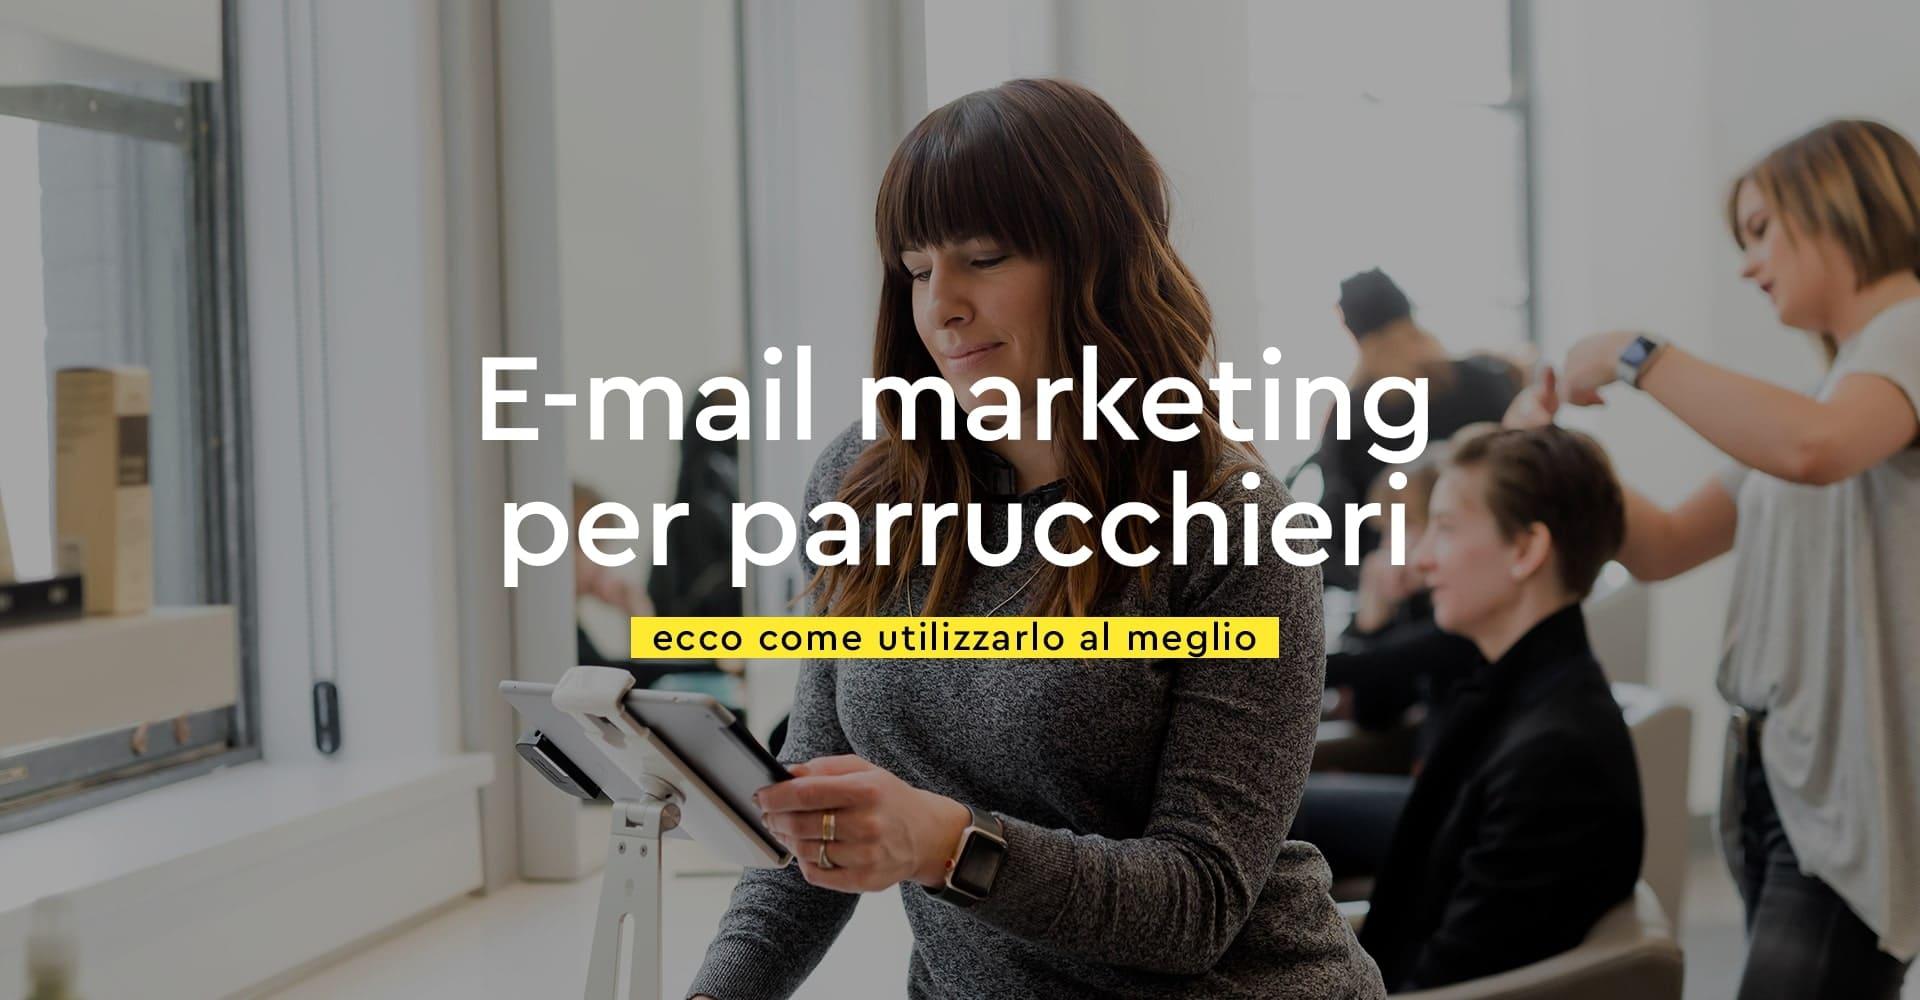 Copertina blog email marketing per parrucchieri